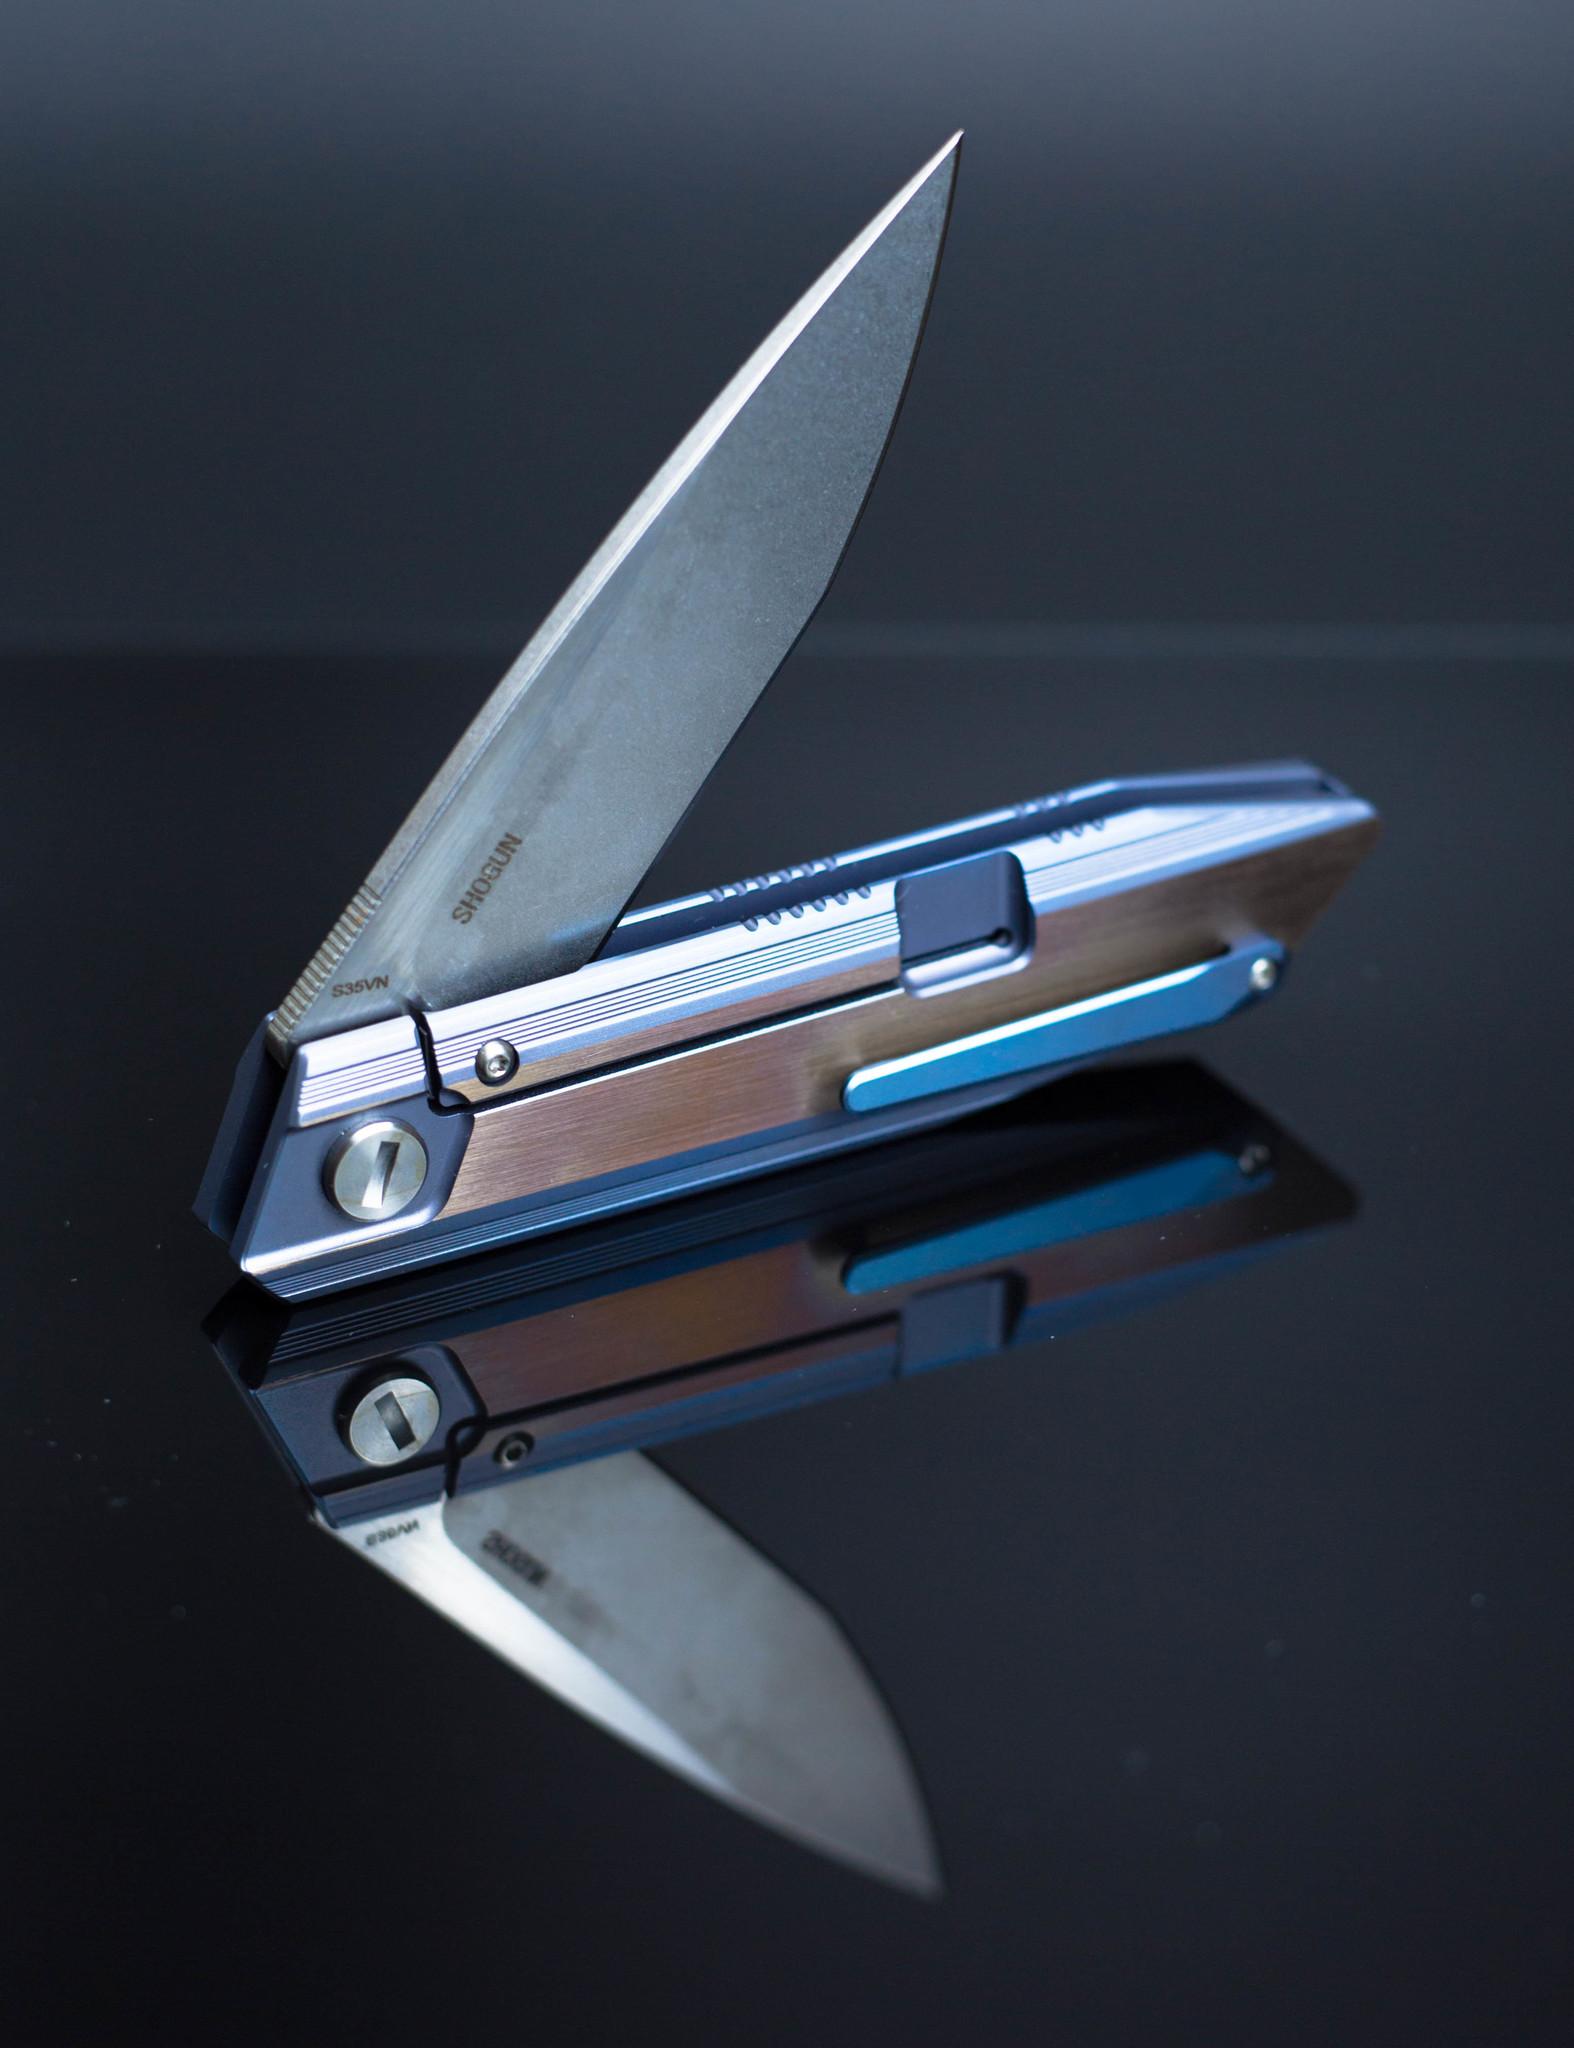 Фото 8 - Складной нож Bestech Knives Shogun BT1701D, сталь CPM-S35VN, рукоять титан